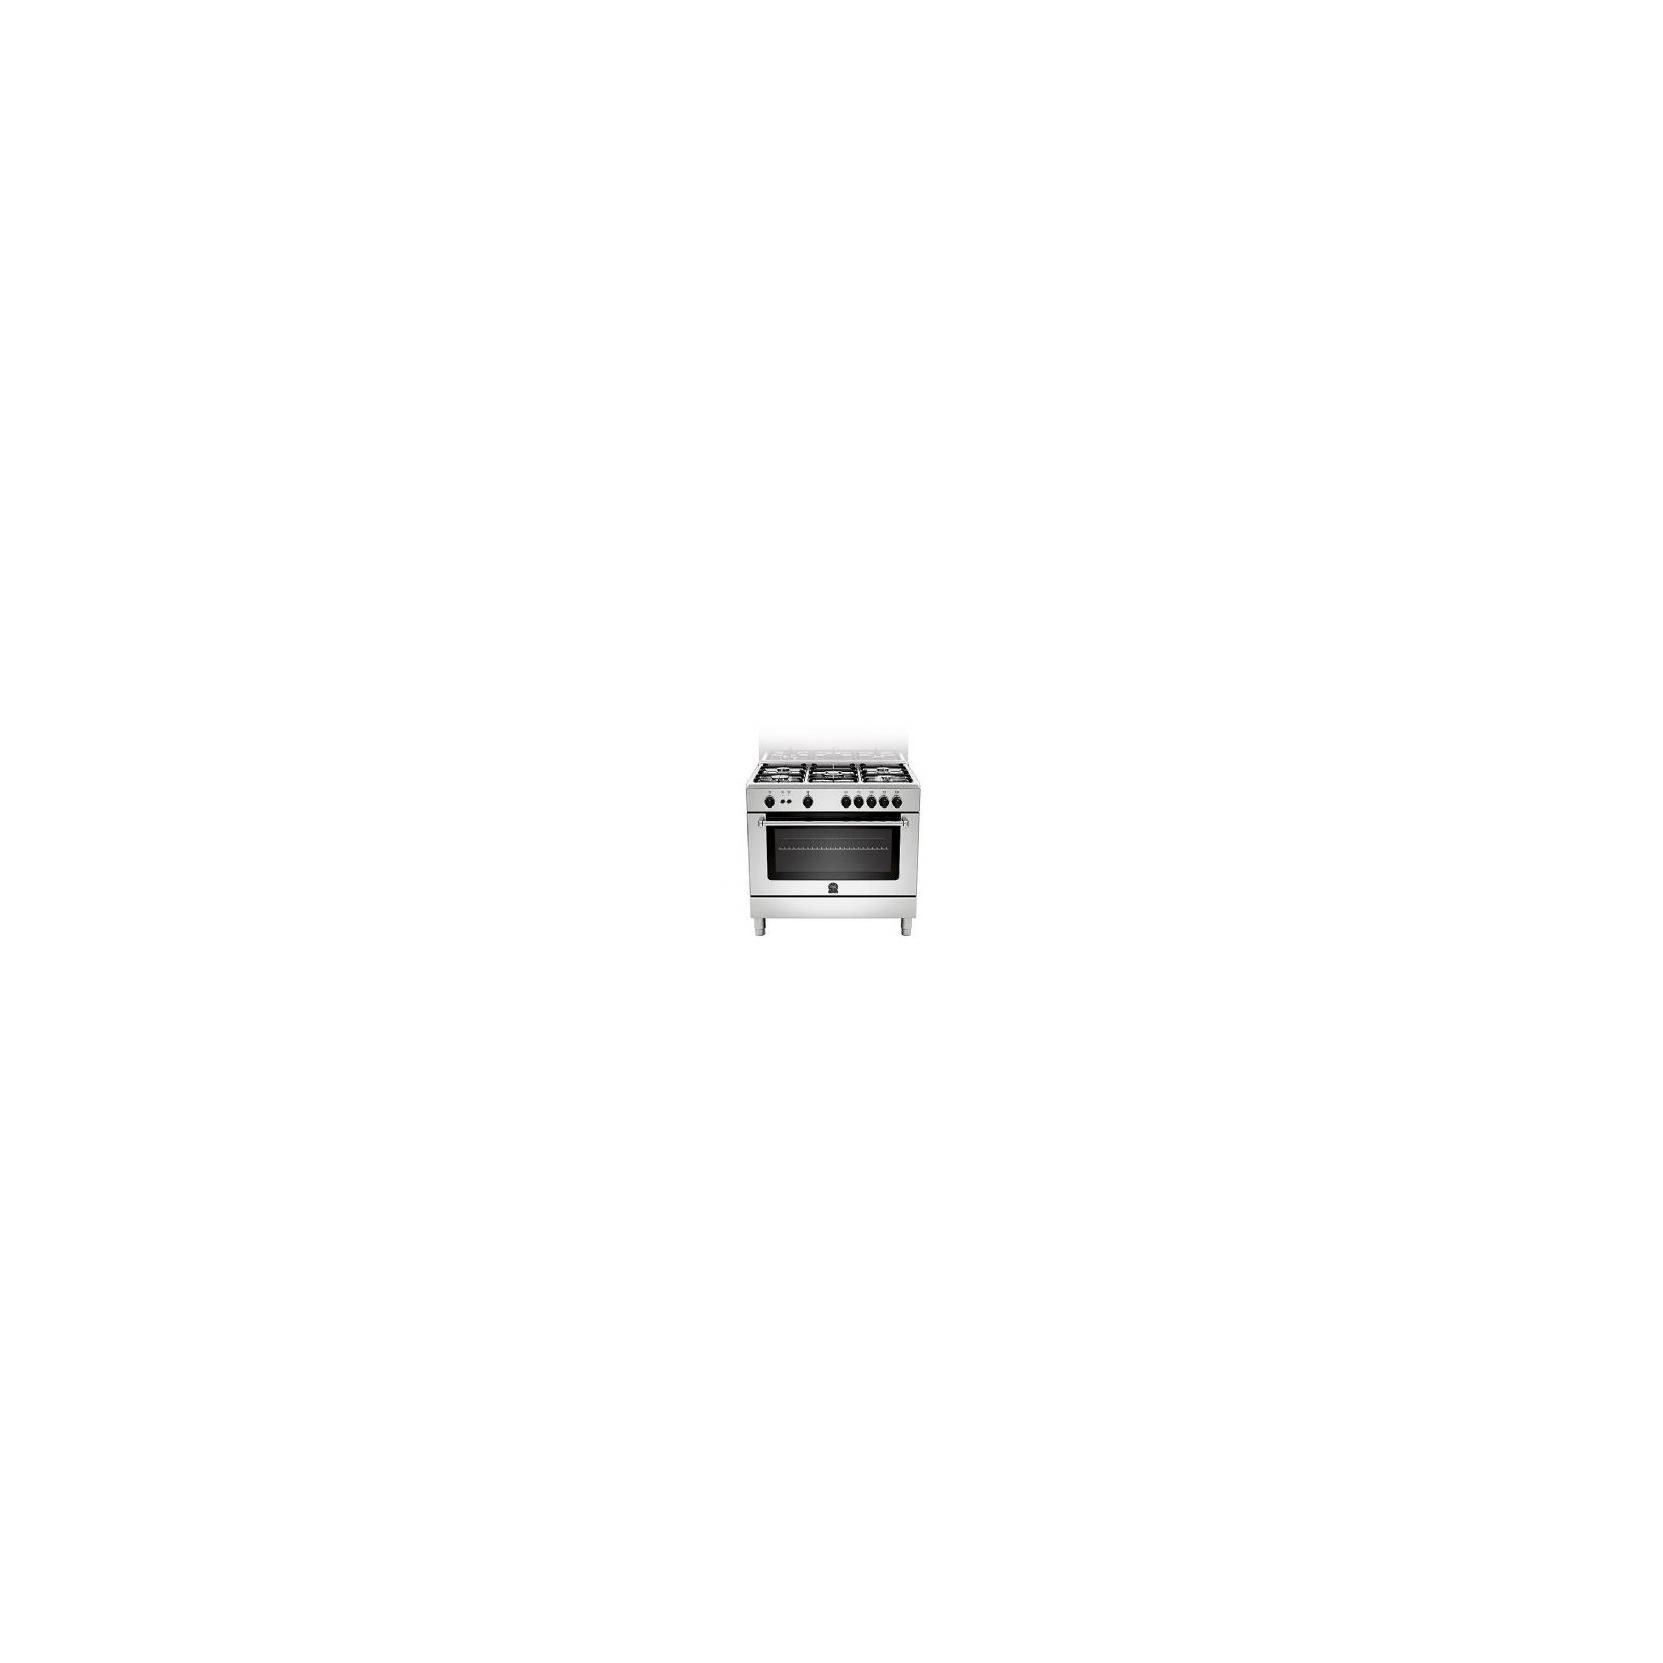 Cucina la germania prezzi 28 images cucine professionali prezzi cucine a gas la germania - Cucina a gas mediaworld ...